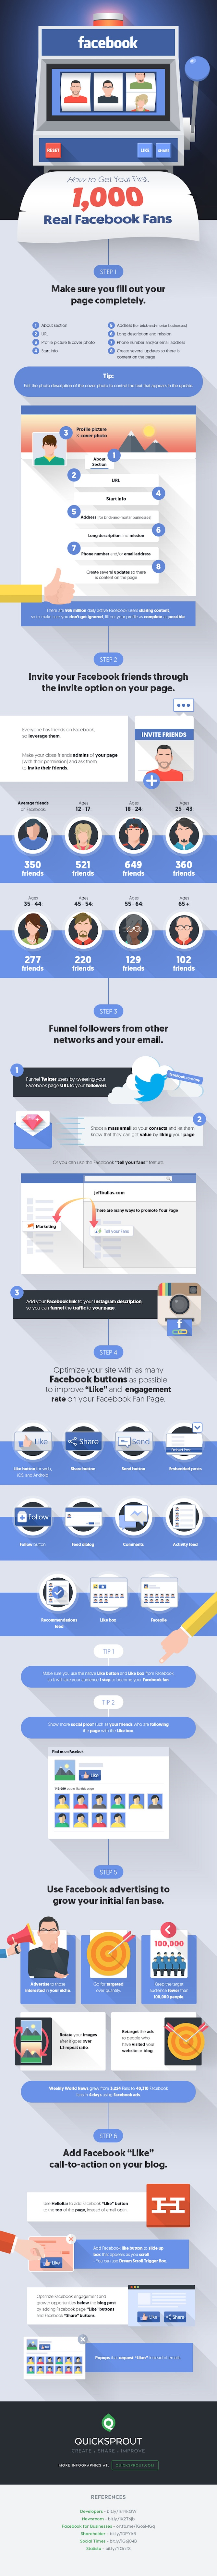 first-thousand-facebook-fans-infographic.jpg